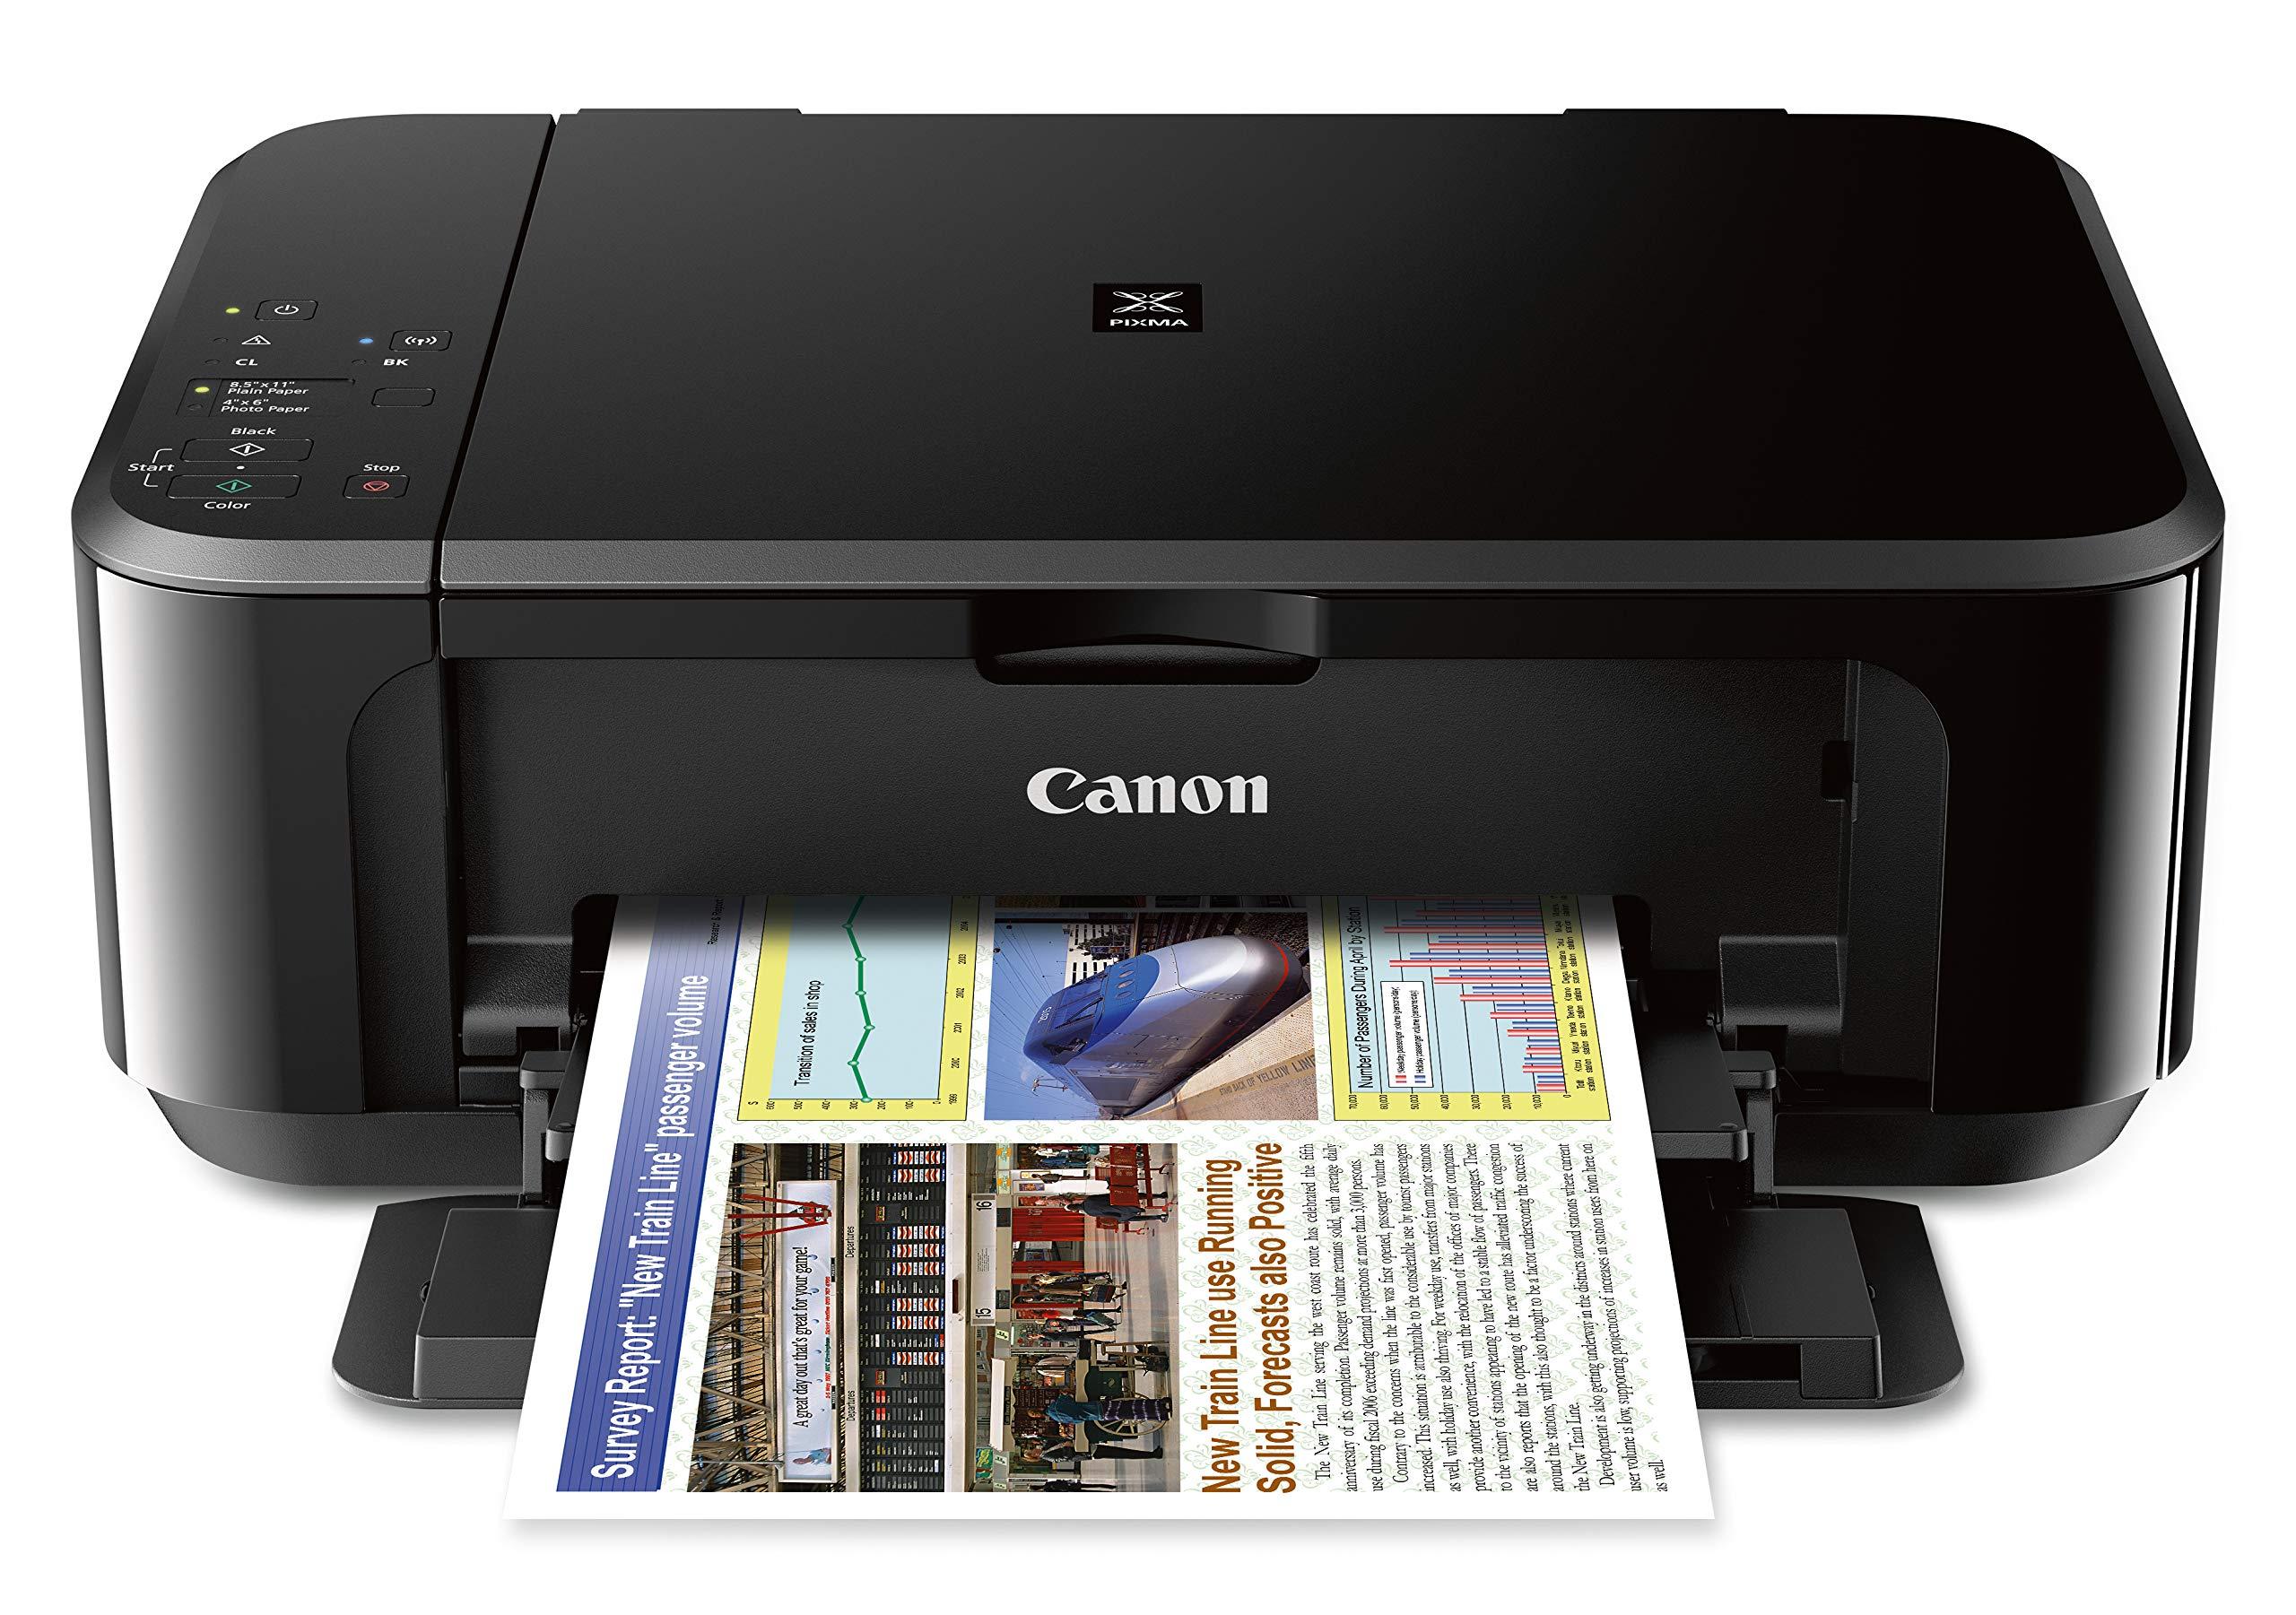 Canon MG3620 Wireless Printer Printing